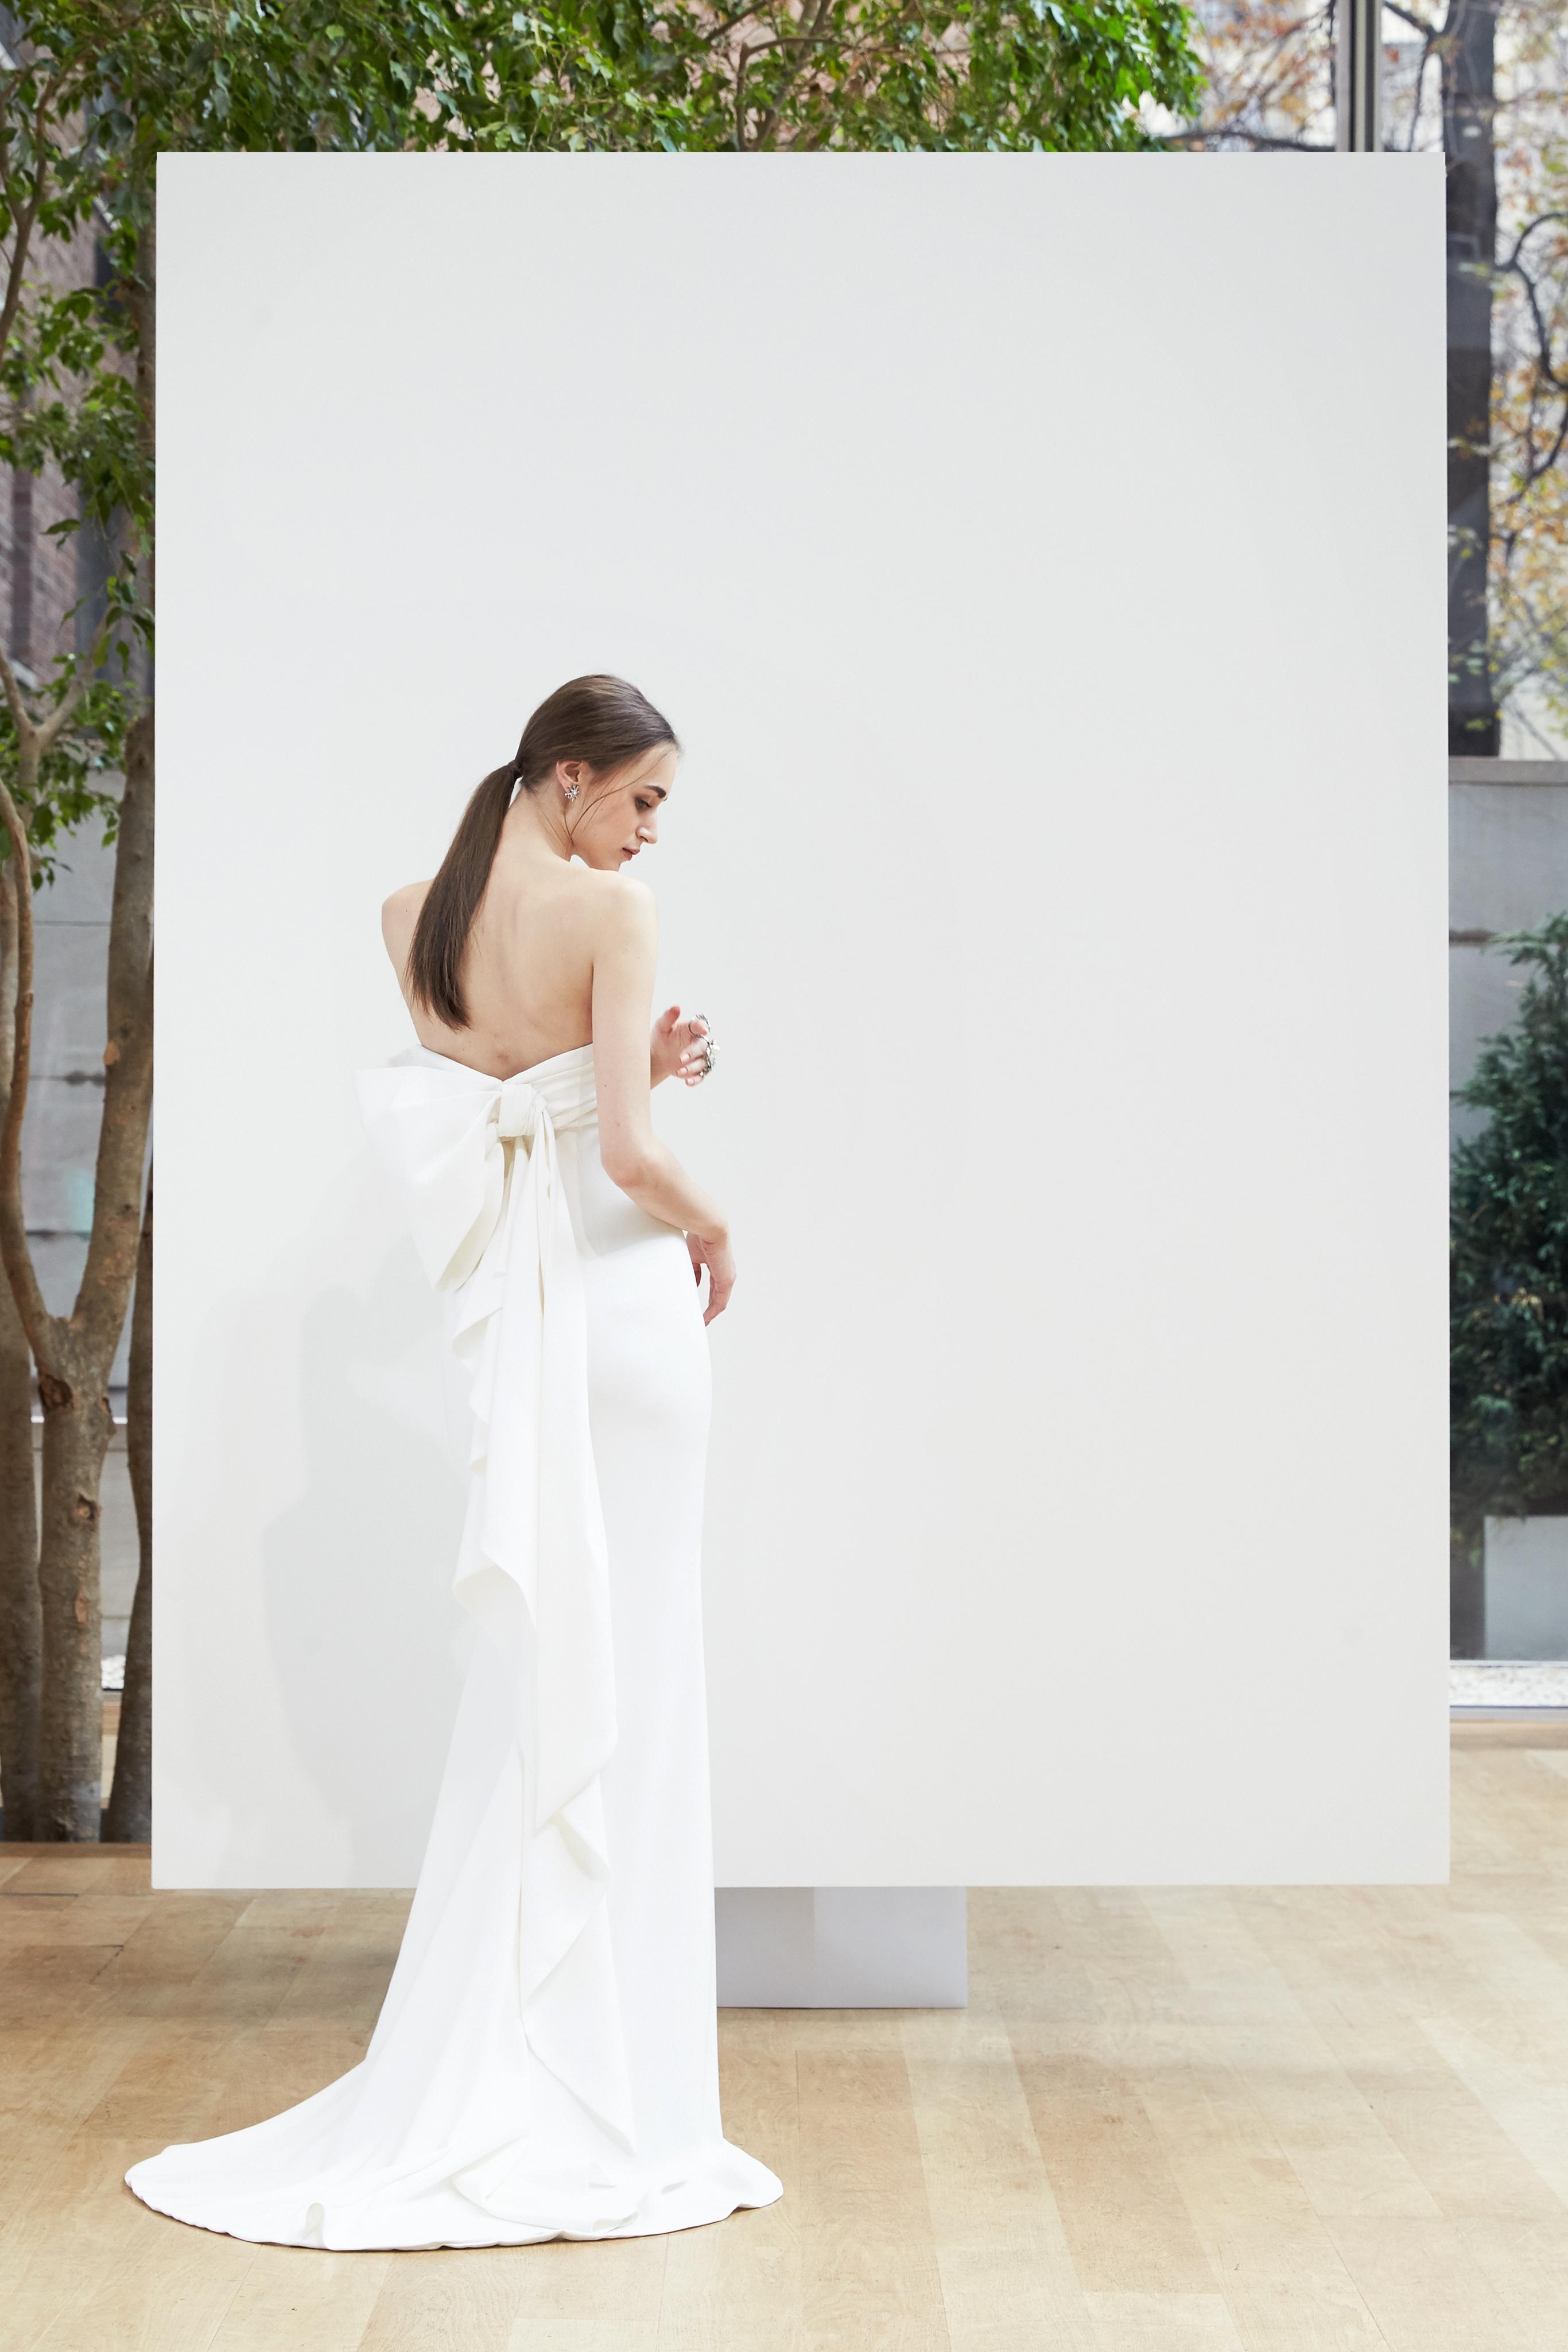 sheath with bow Oscar de la Renta Spring 2018 Wedding Dress Collection